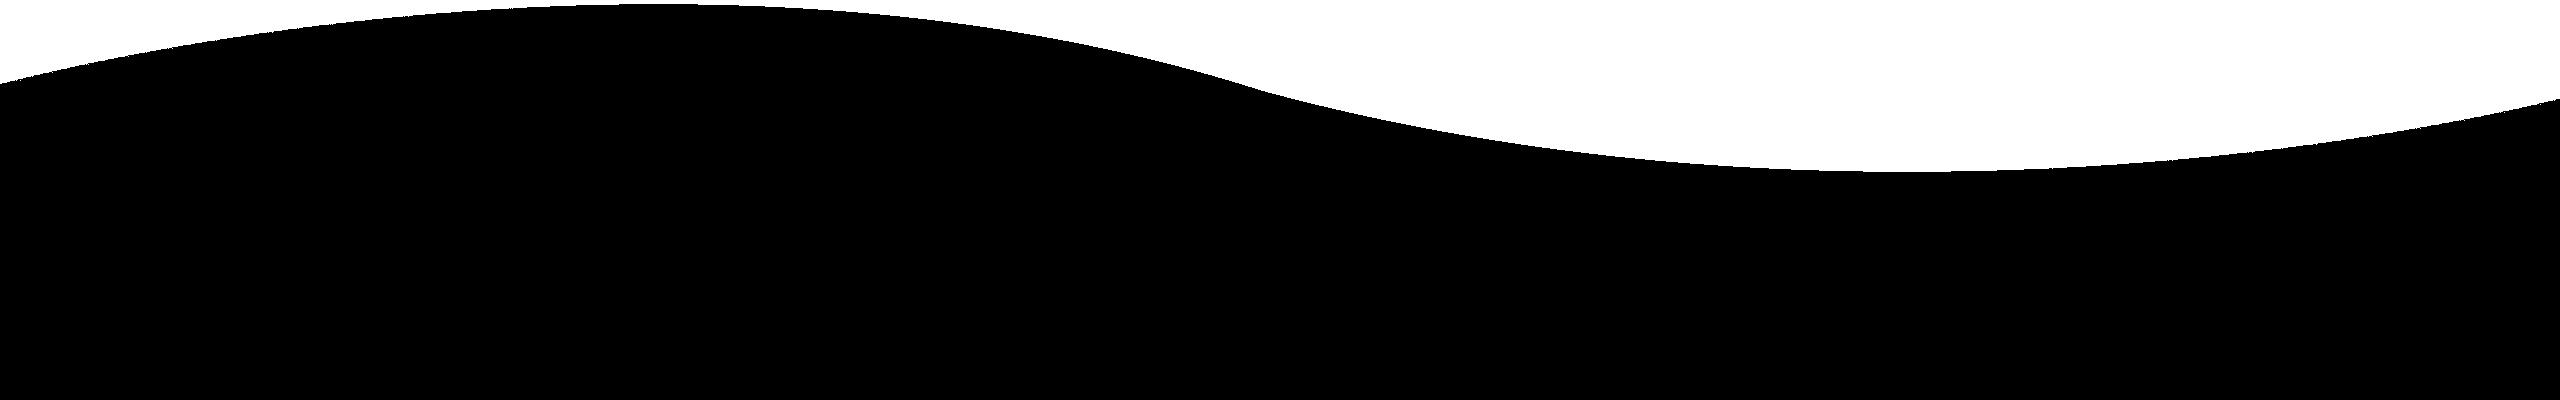 dark green soccer background